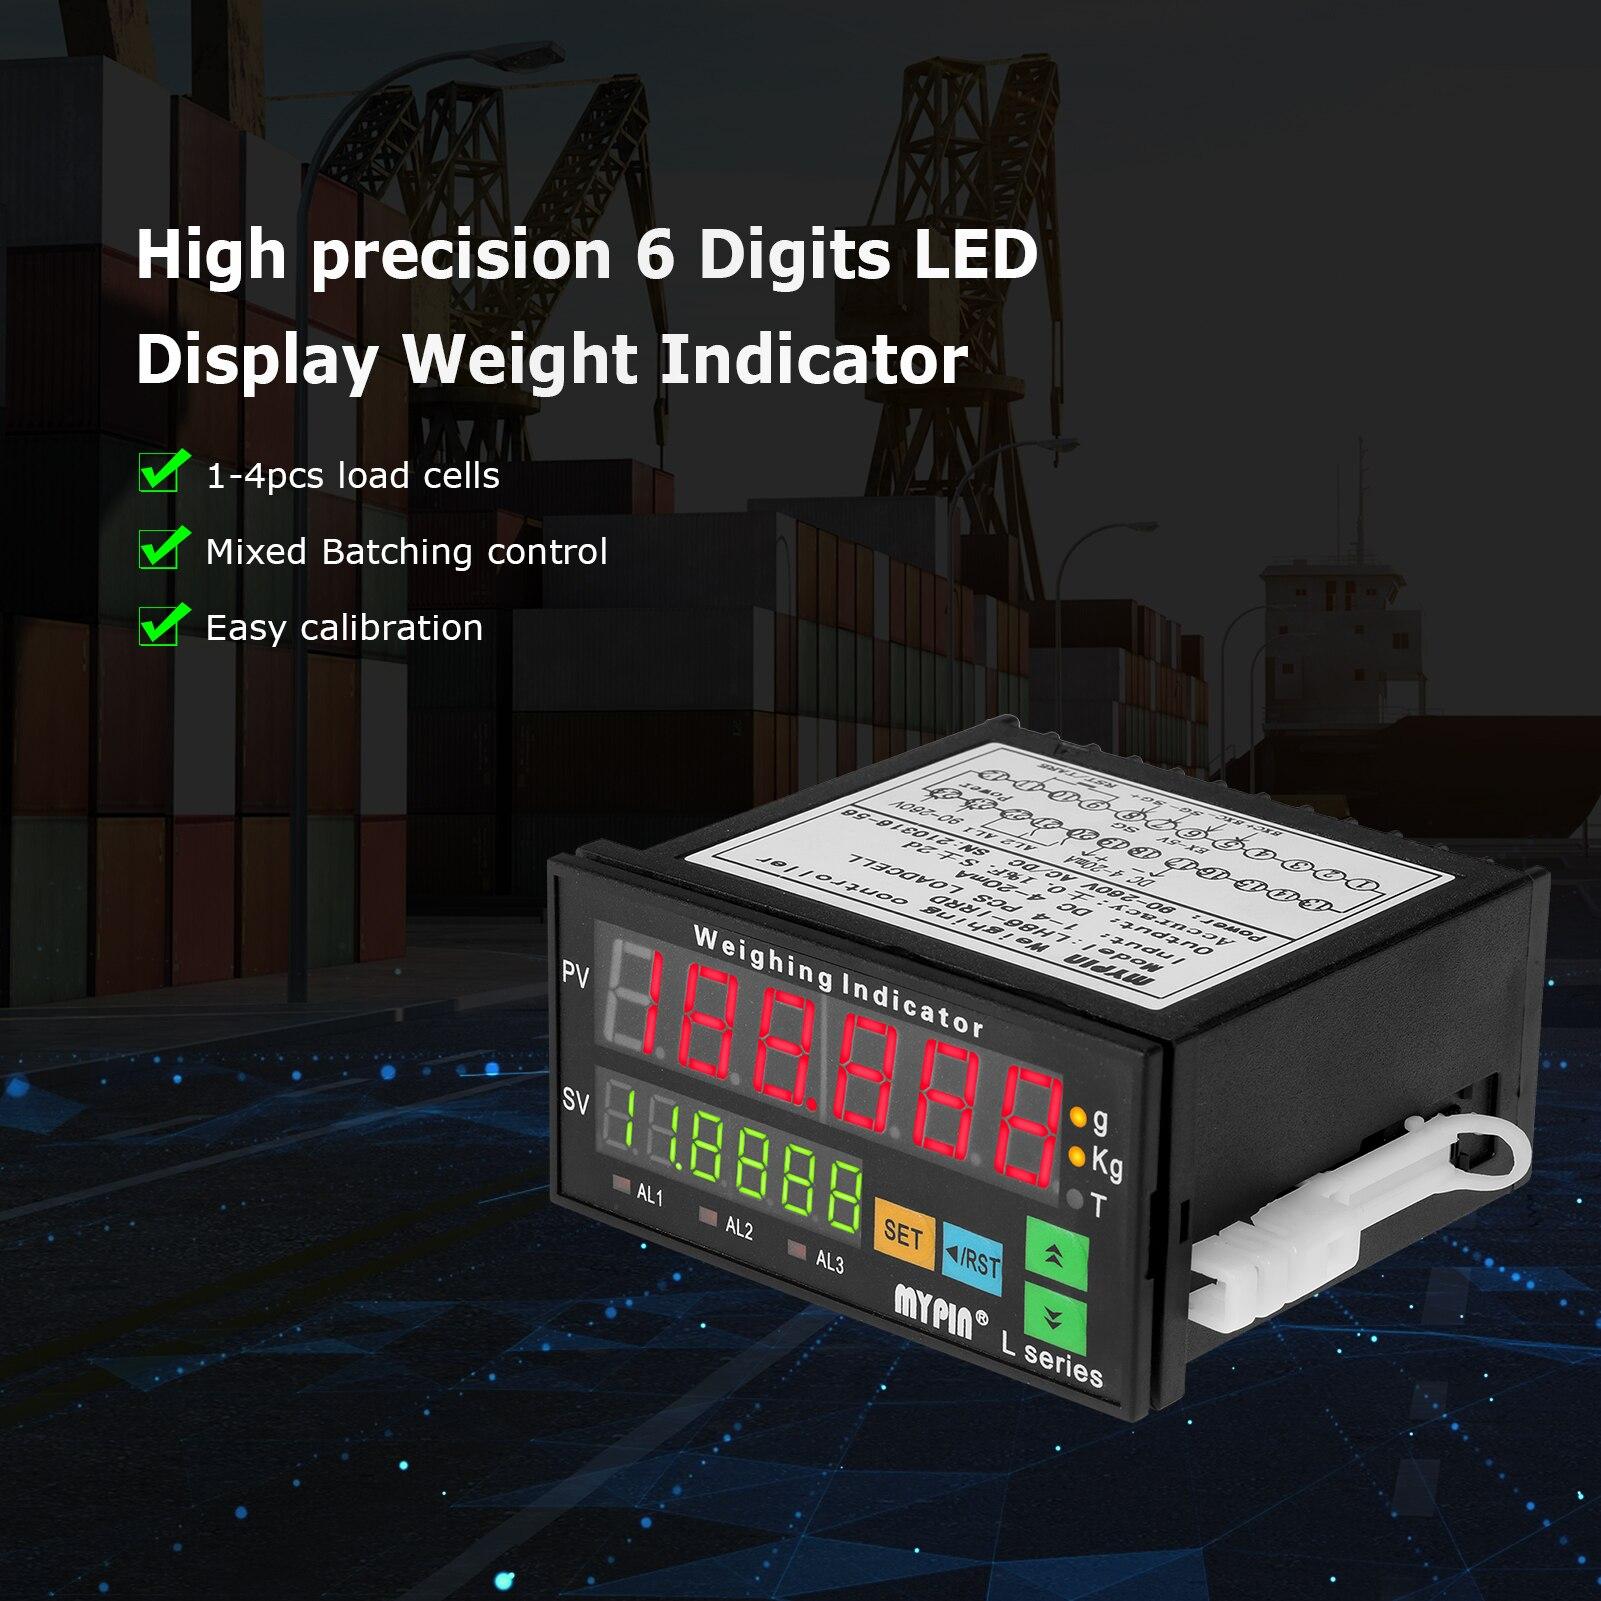 Mypin LH86-IRRD 6 أرقام LED عرض مؤشر الوزن عالية الدقة الرقمية وزنها تحكم مؤشر الحمل الخلايا